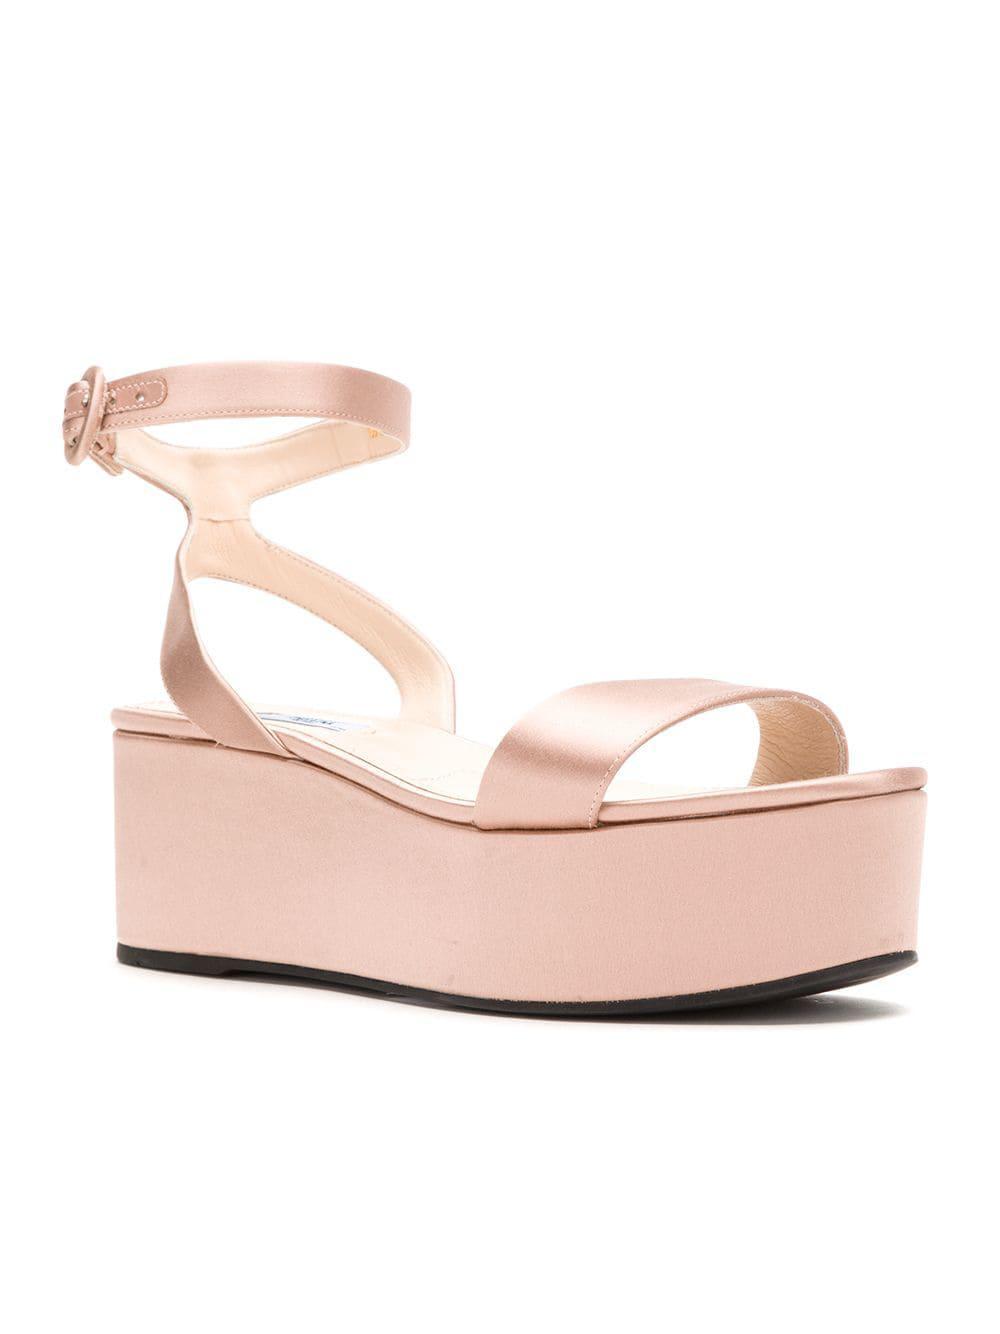 Prada - Pink Open Toe Platform Sandals - Lyst. View fullscreen 8265ddbe66